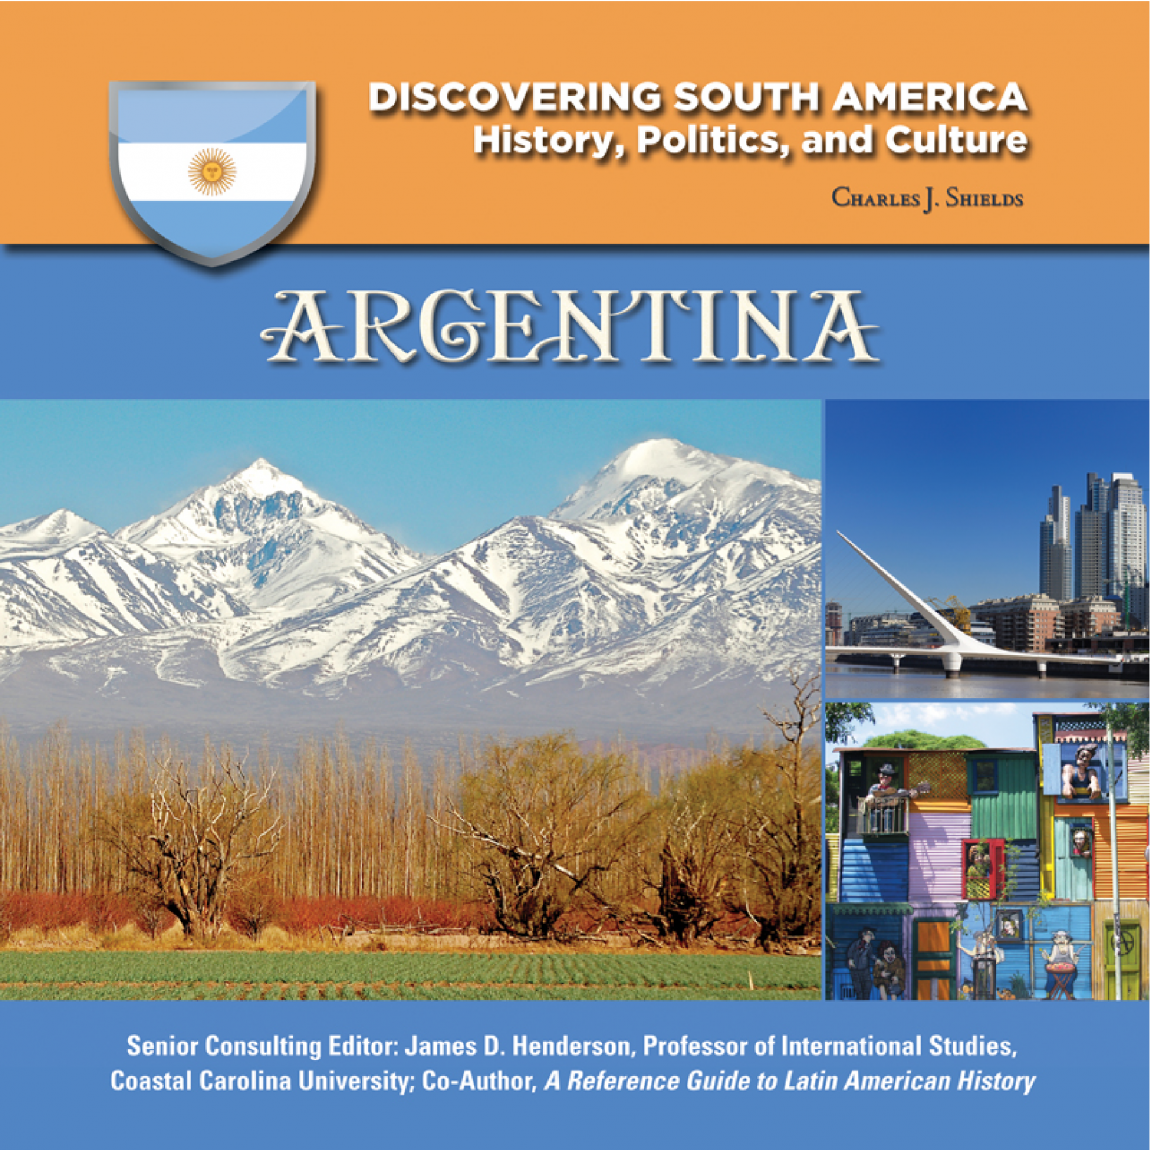 argentina-01.png